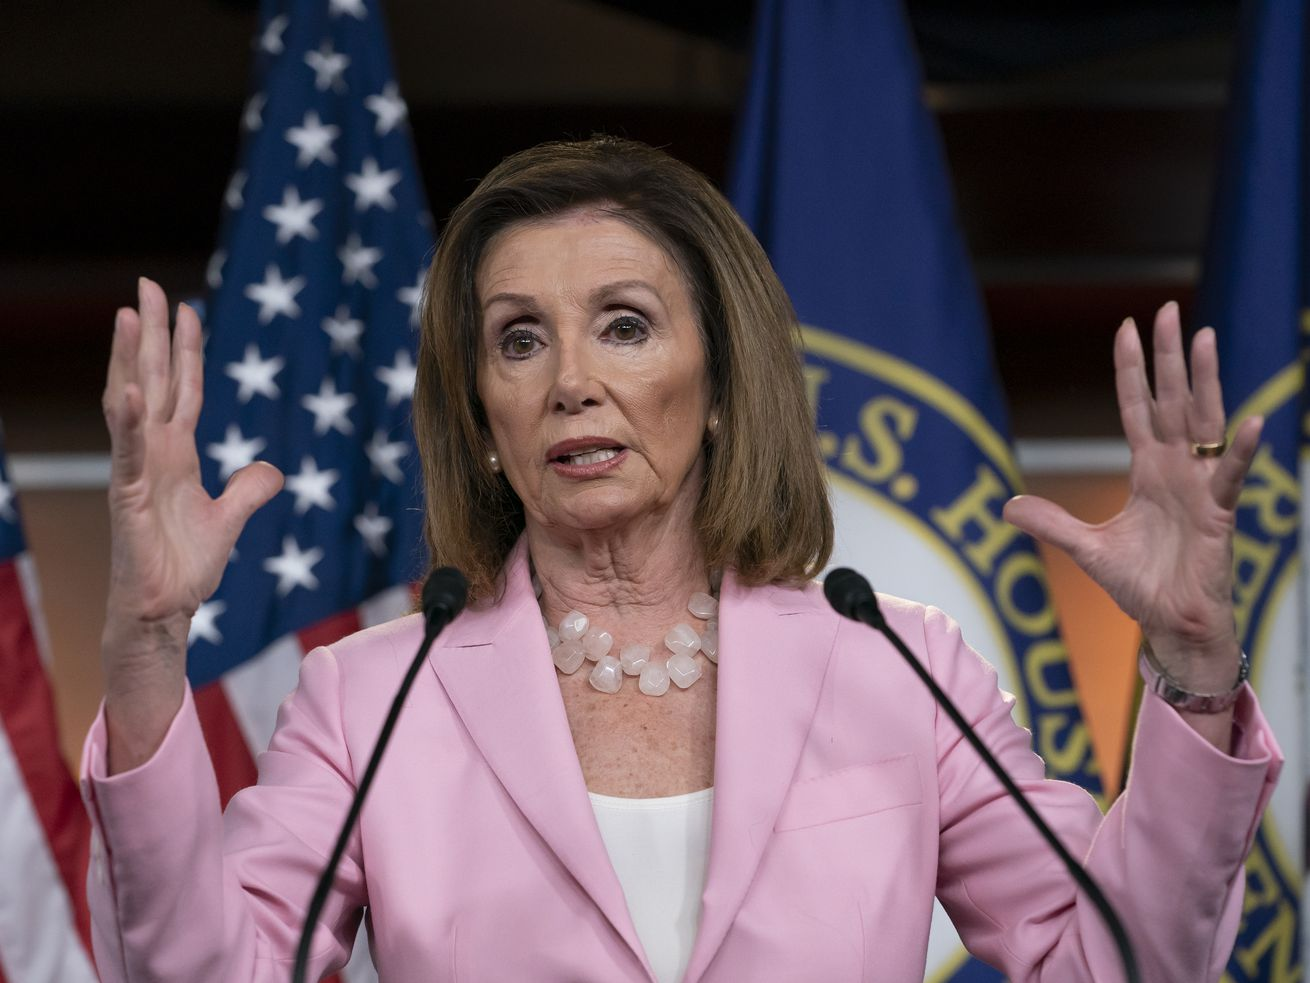 Wait, does Nancy Pelosi want impeachment or fresh peaches?